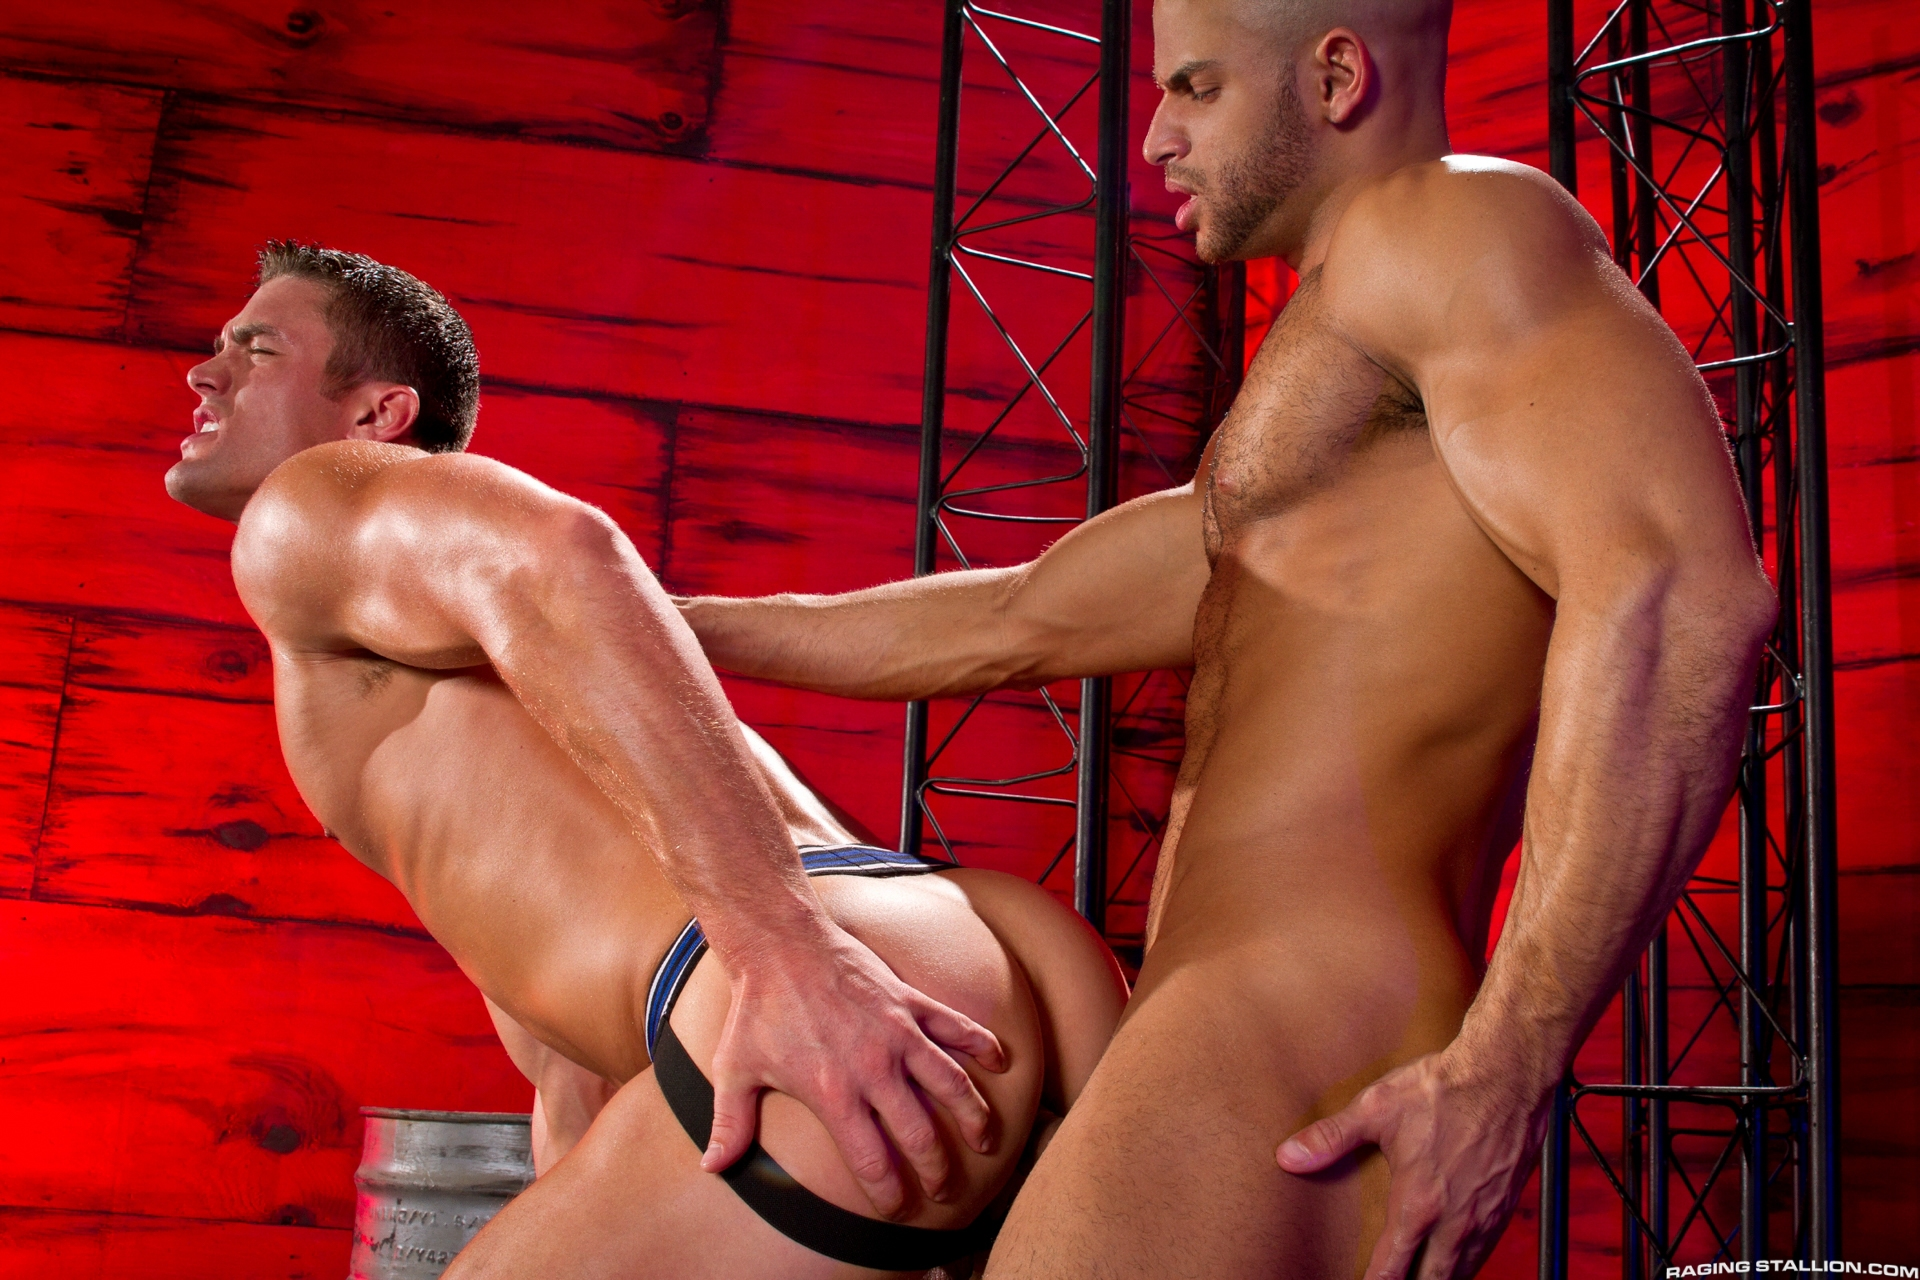 Gallery gay jock